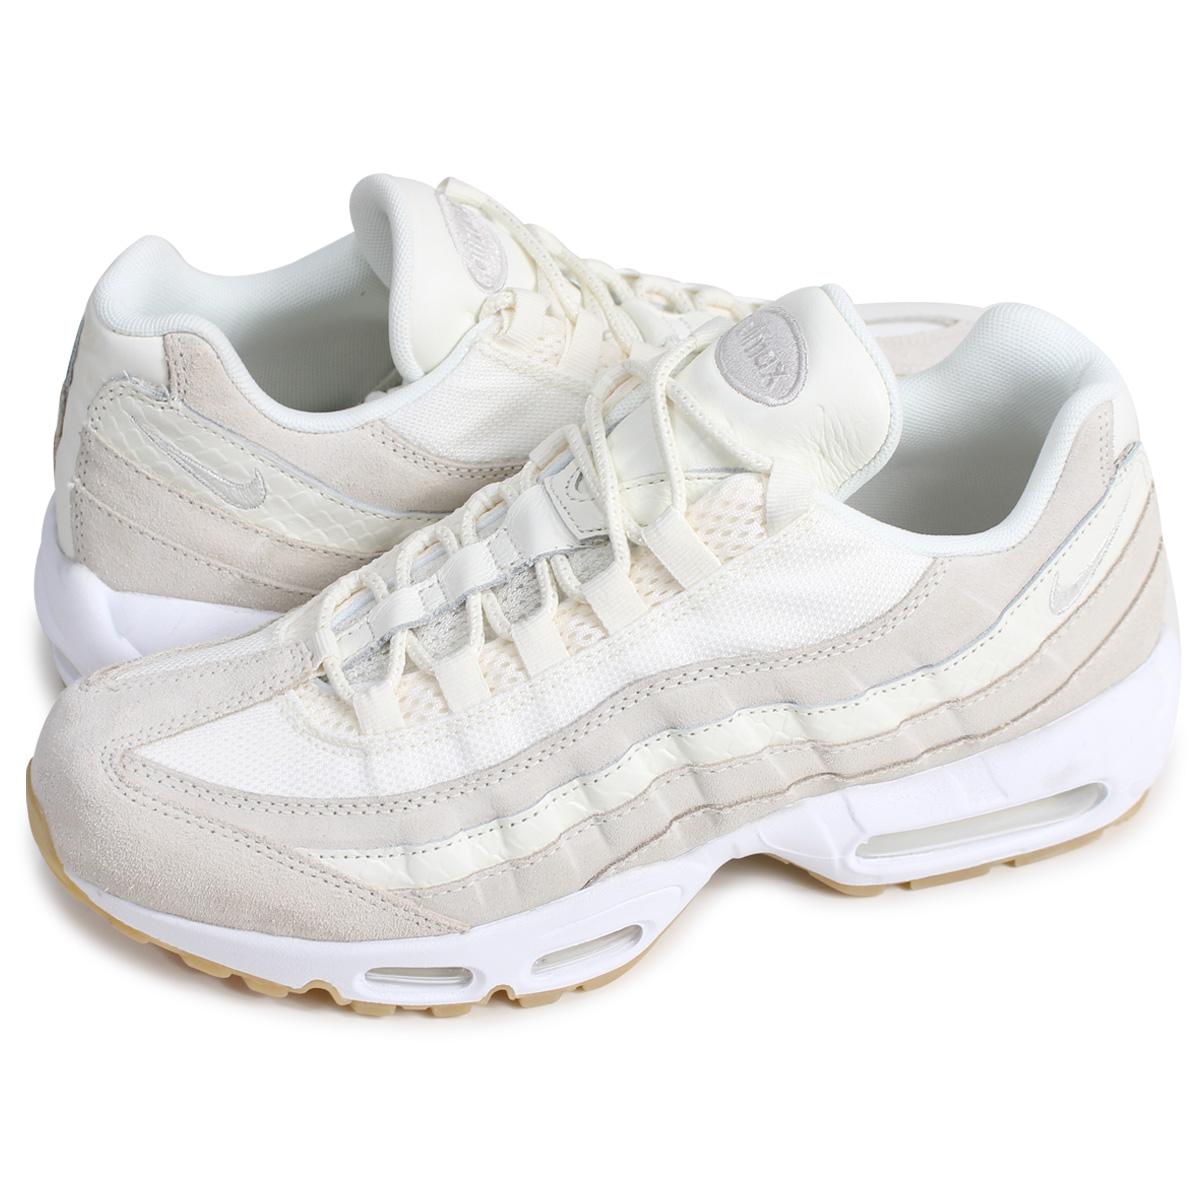 Nike 538416 102 ws a